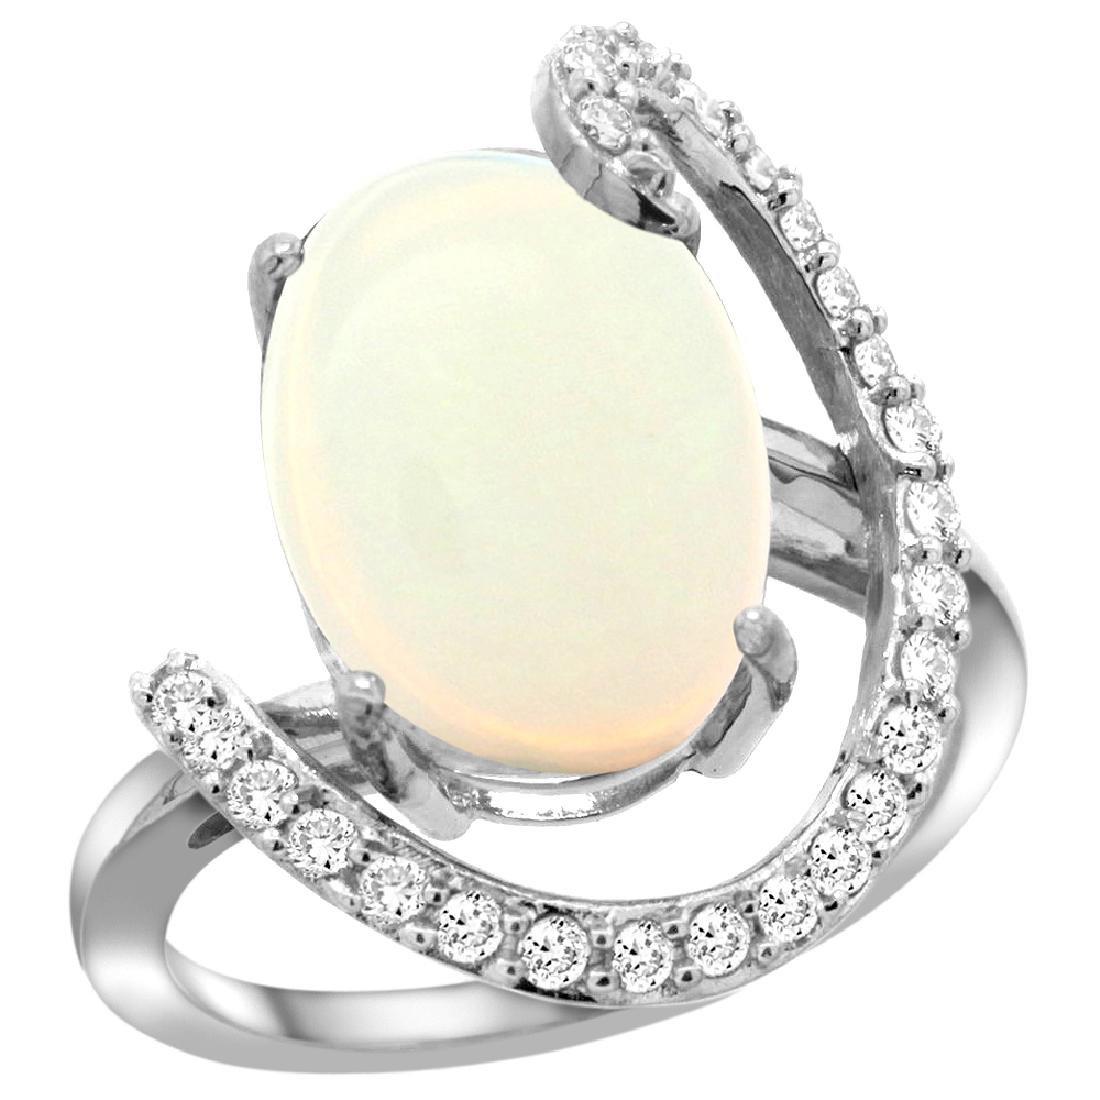 Natural 5.89 ctw Opal & Diamond Engagement Ring 14K